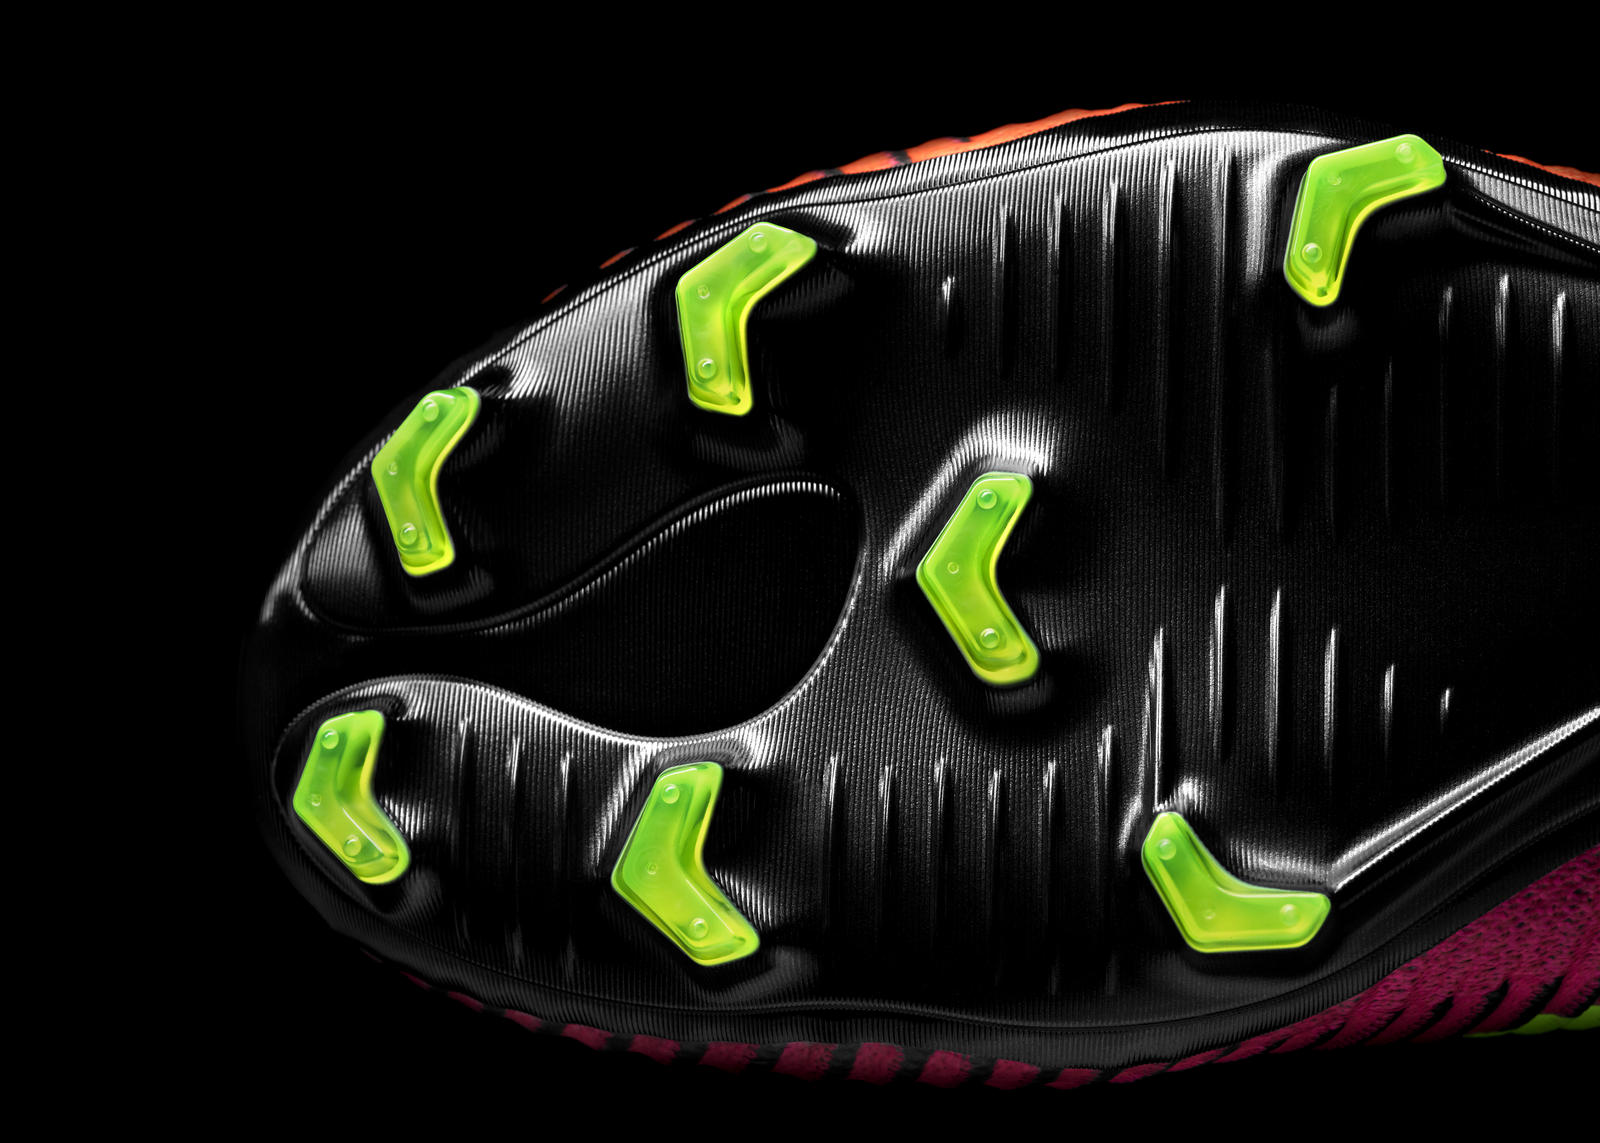 SU16_FB_Mercurial_Plate_14190-1 Nike Spark Brilliance Mercurial Cleats